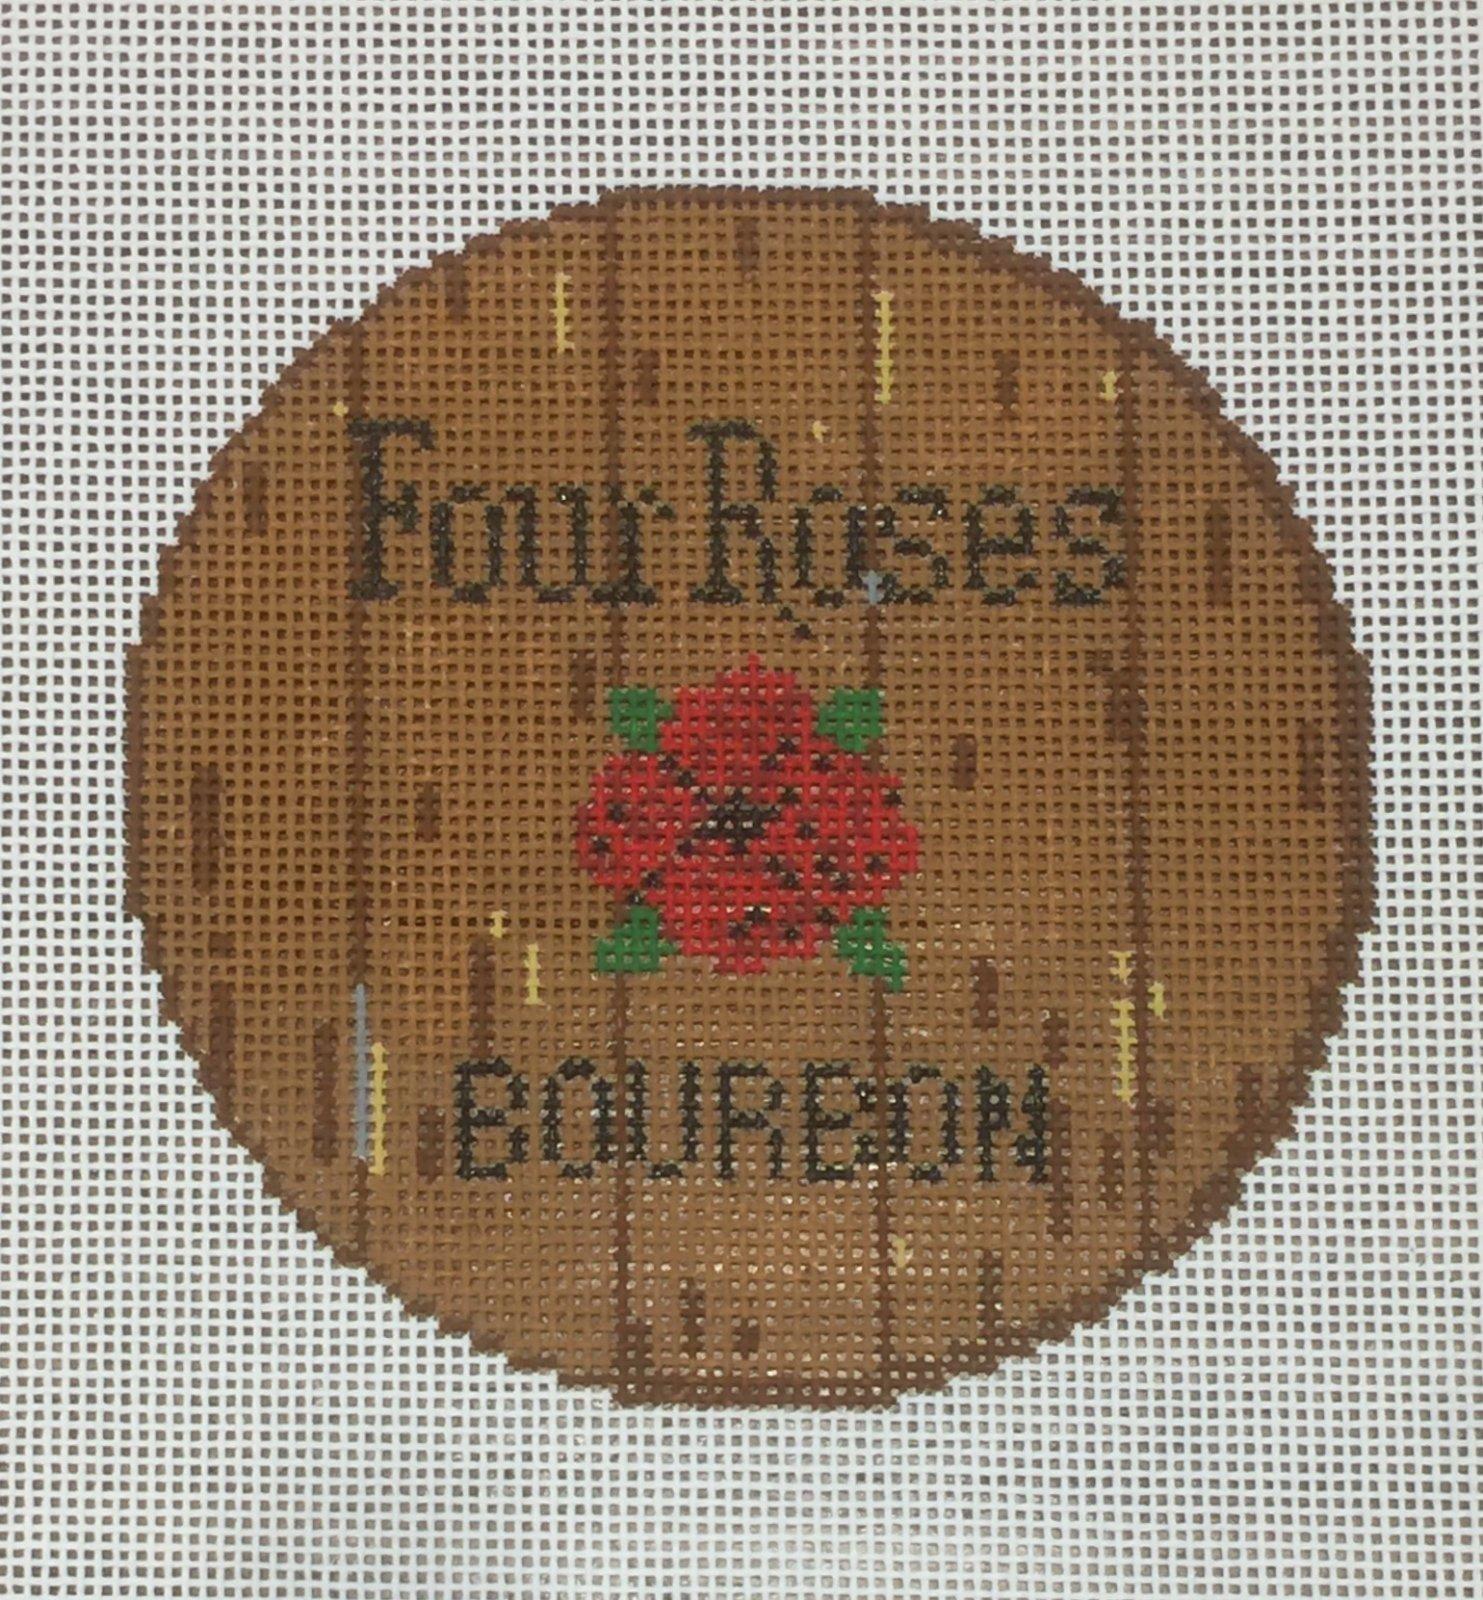 Bourbon Barrel Head - Four Roses